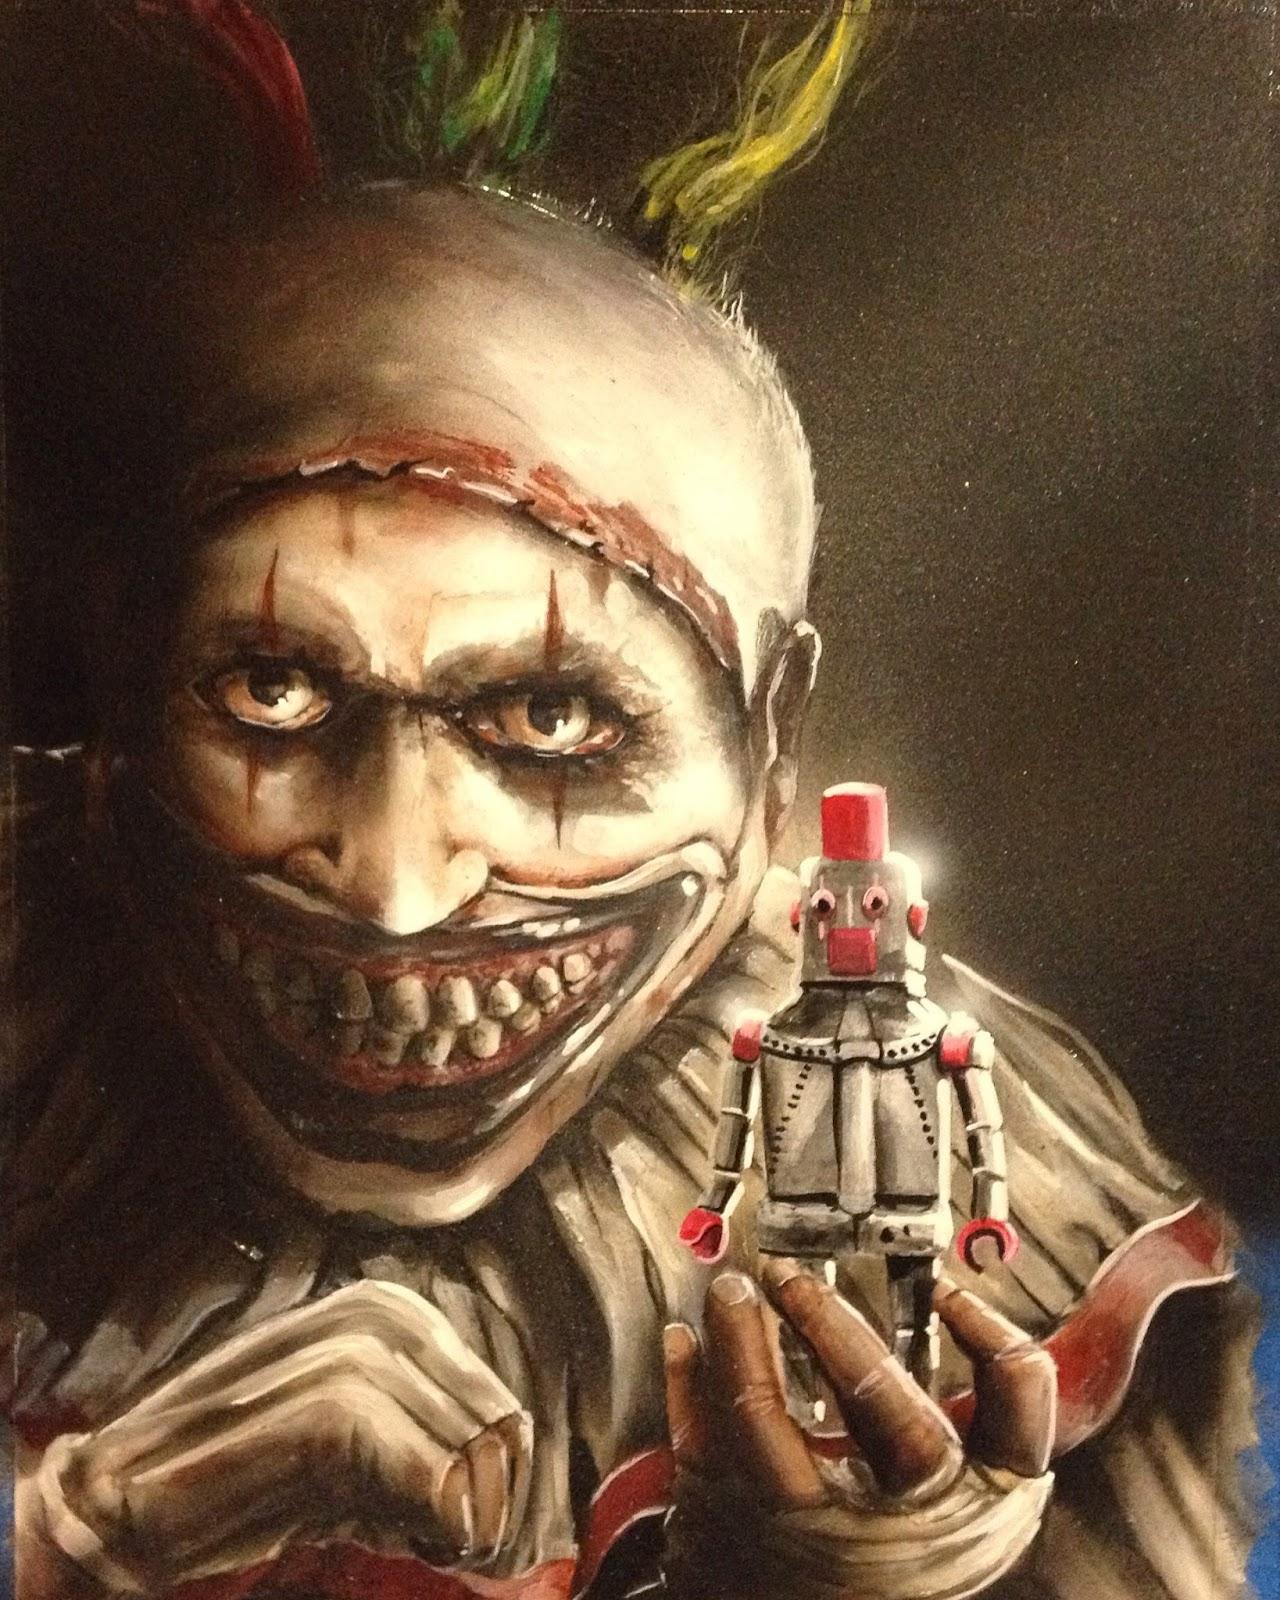 Horror: American Horror Story Fan Art Exhibition Photos @AHSFX